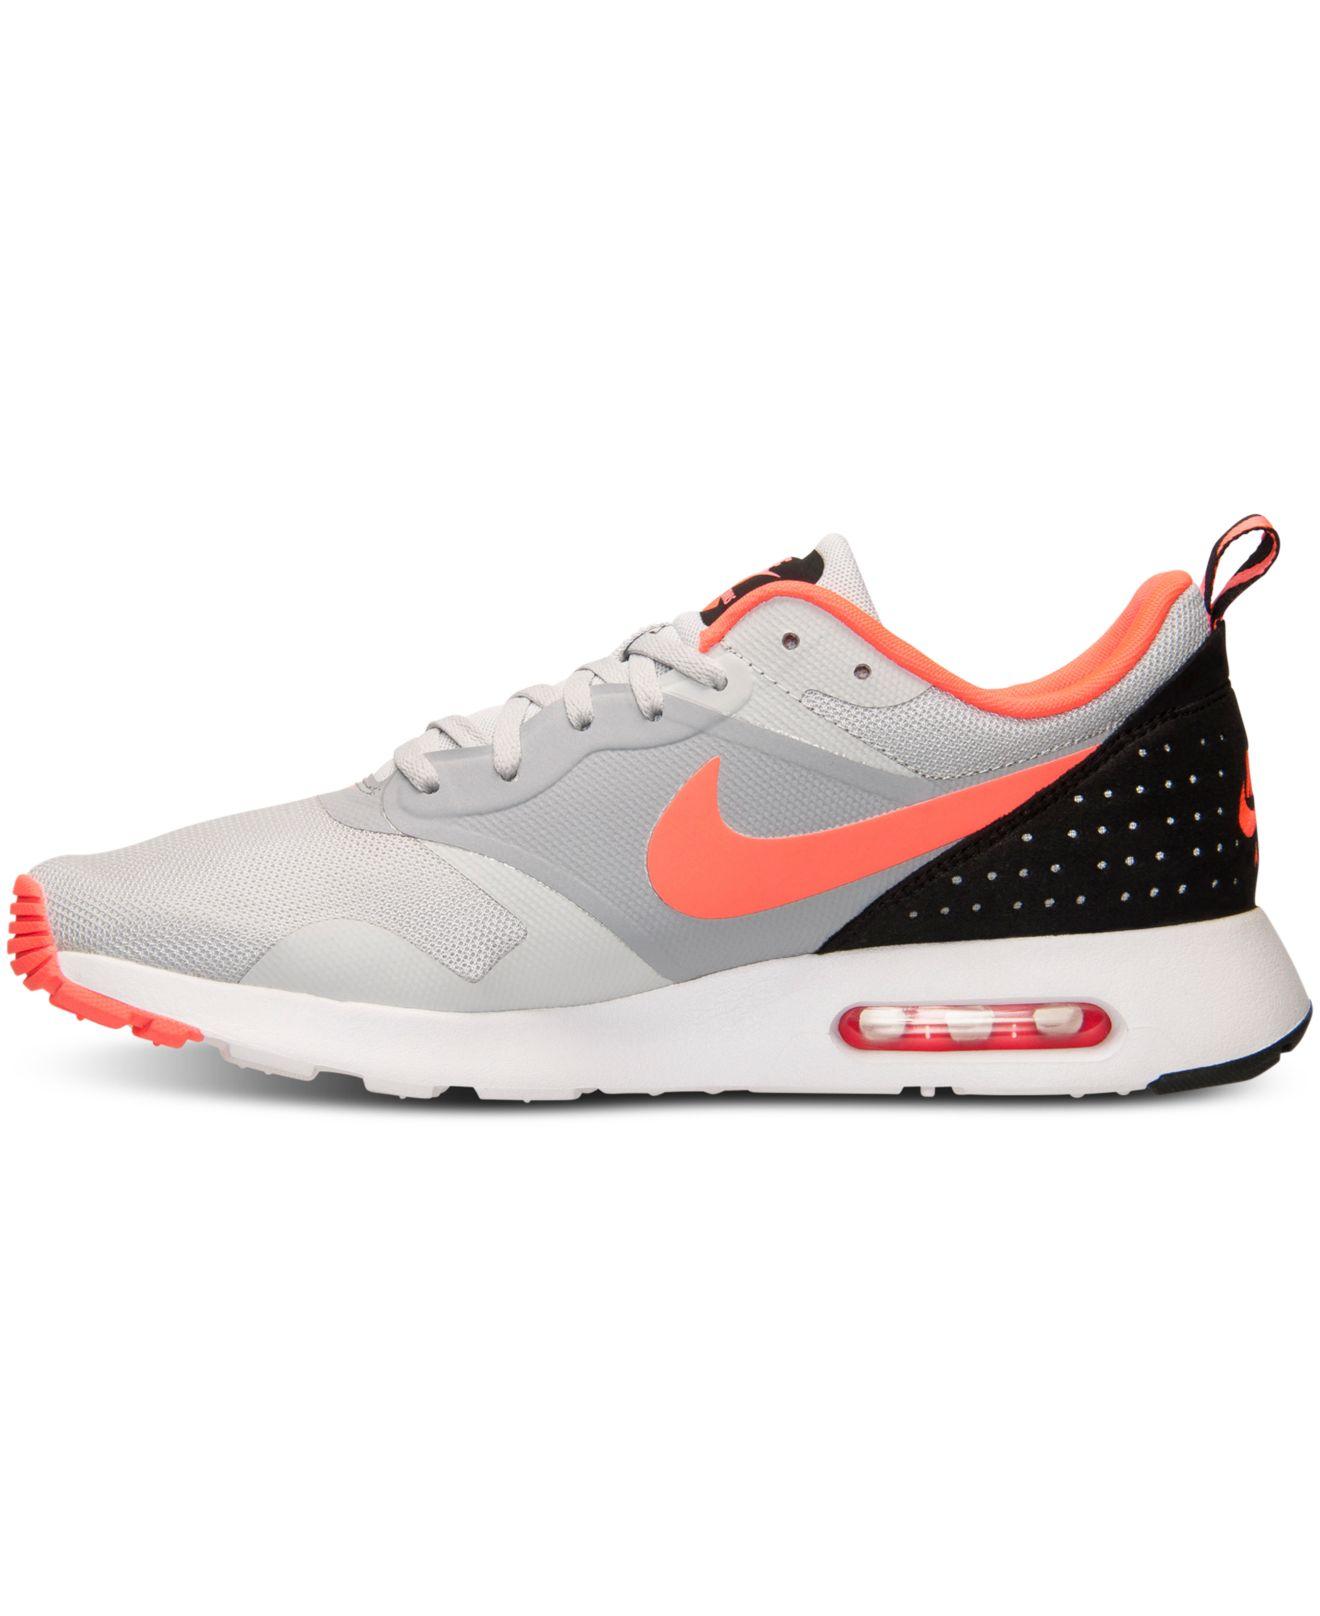 half off 39961 b7f30 switzerland lyst nike mens air max tavas running sneakers from finish line  in c6290 5b496